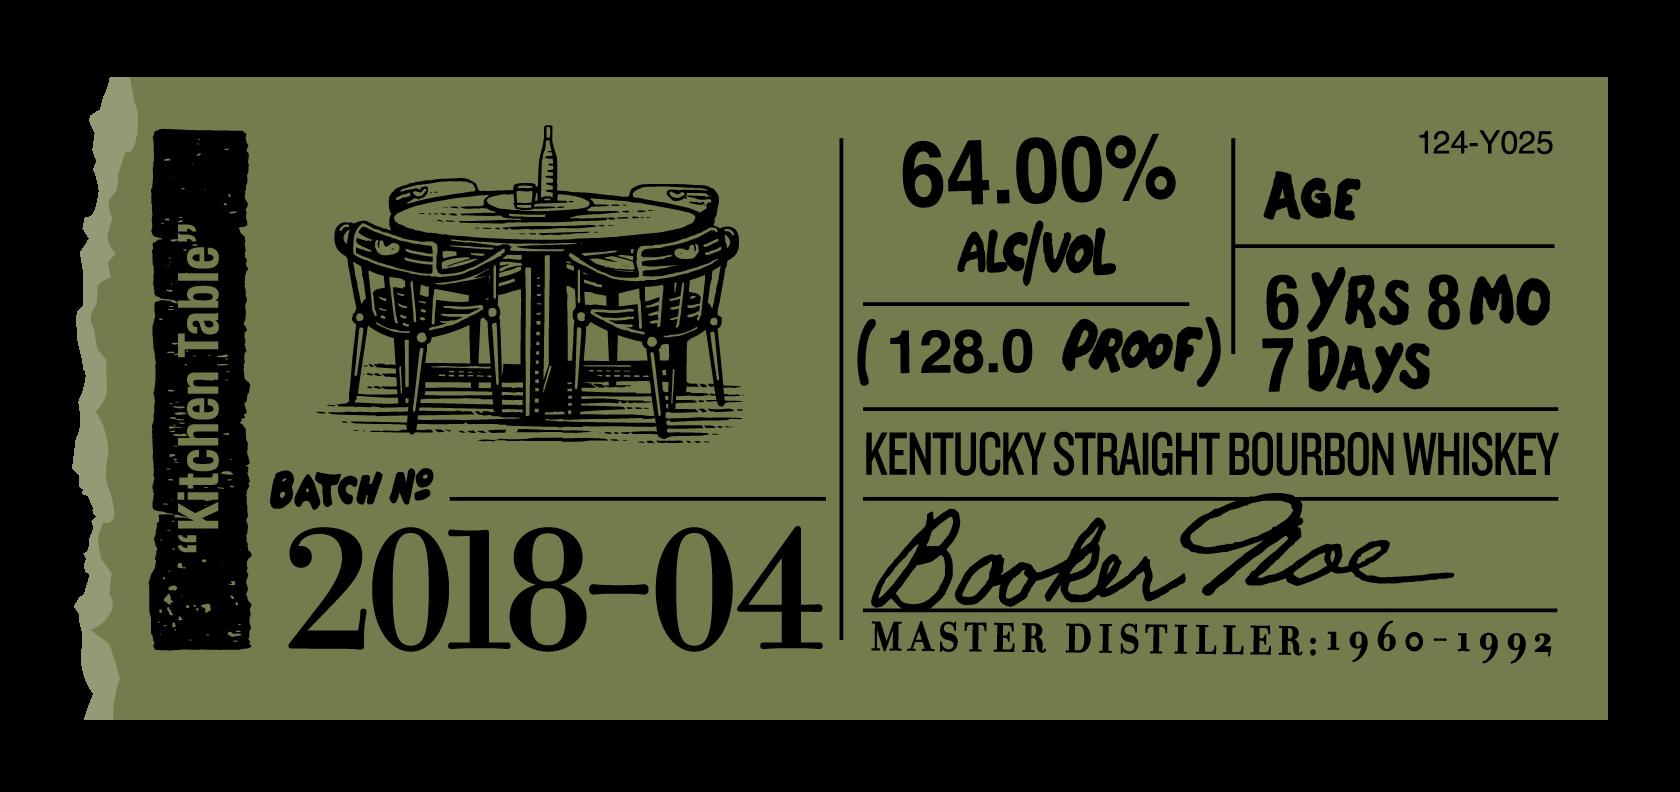 Booker S Bourbon 04 Kitchen Table